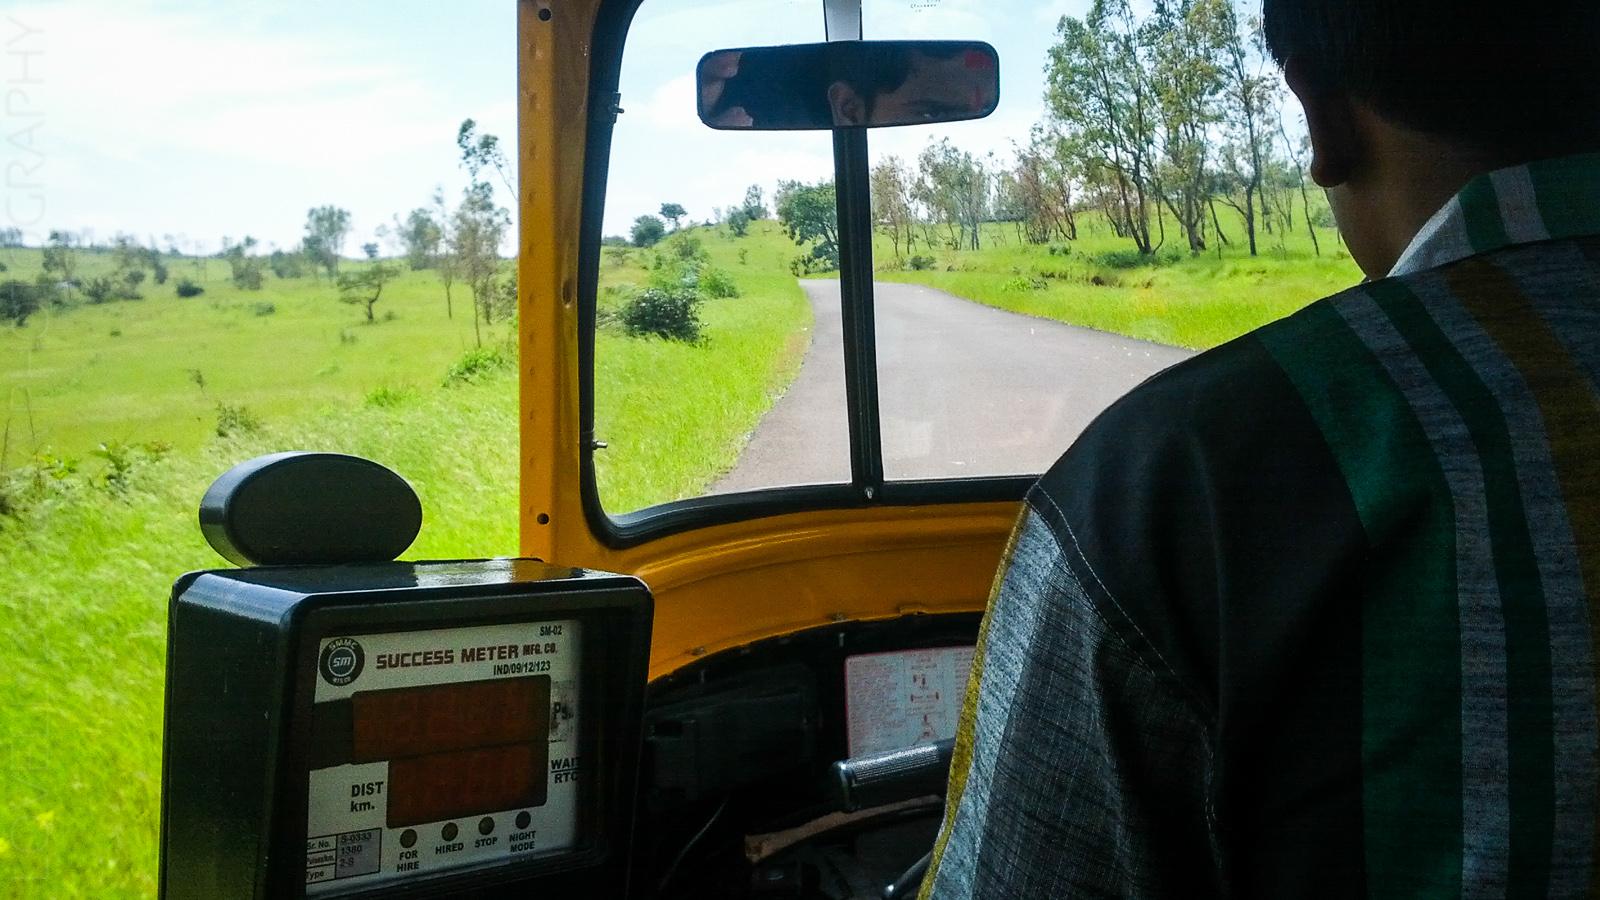 Autorickshaw to Thoseghar